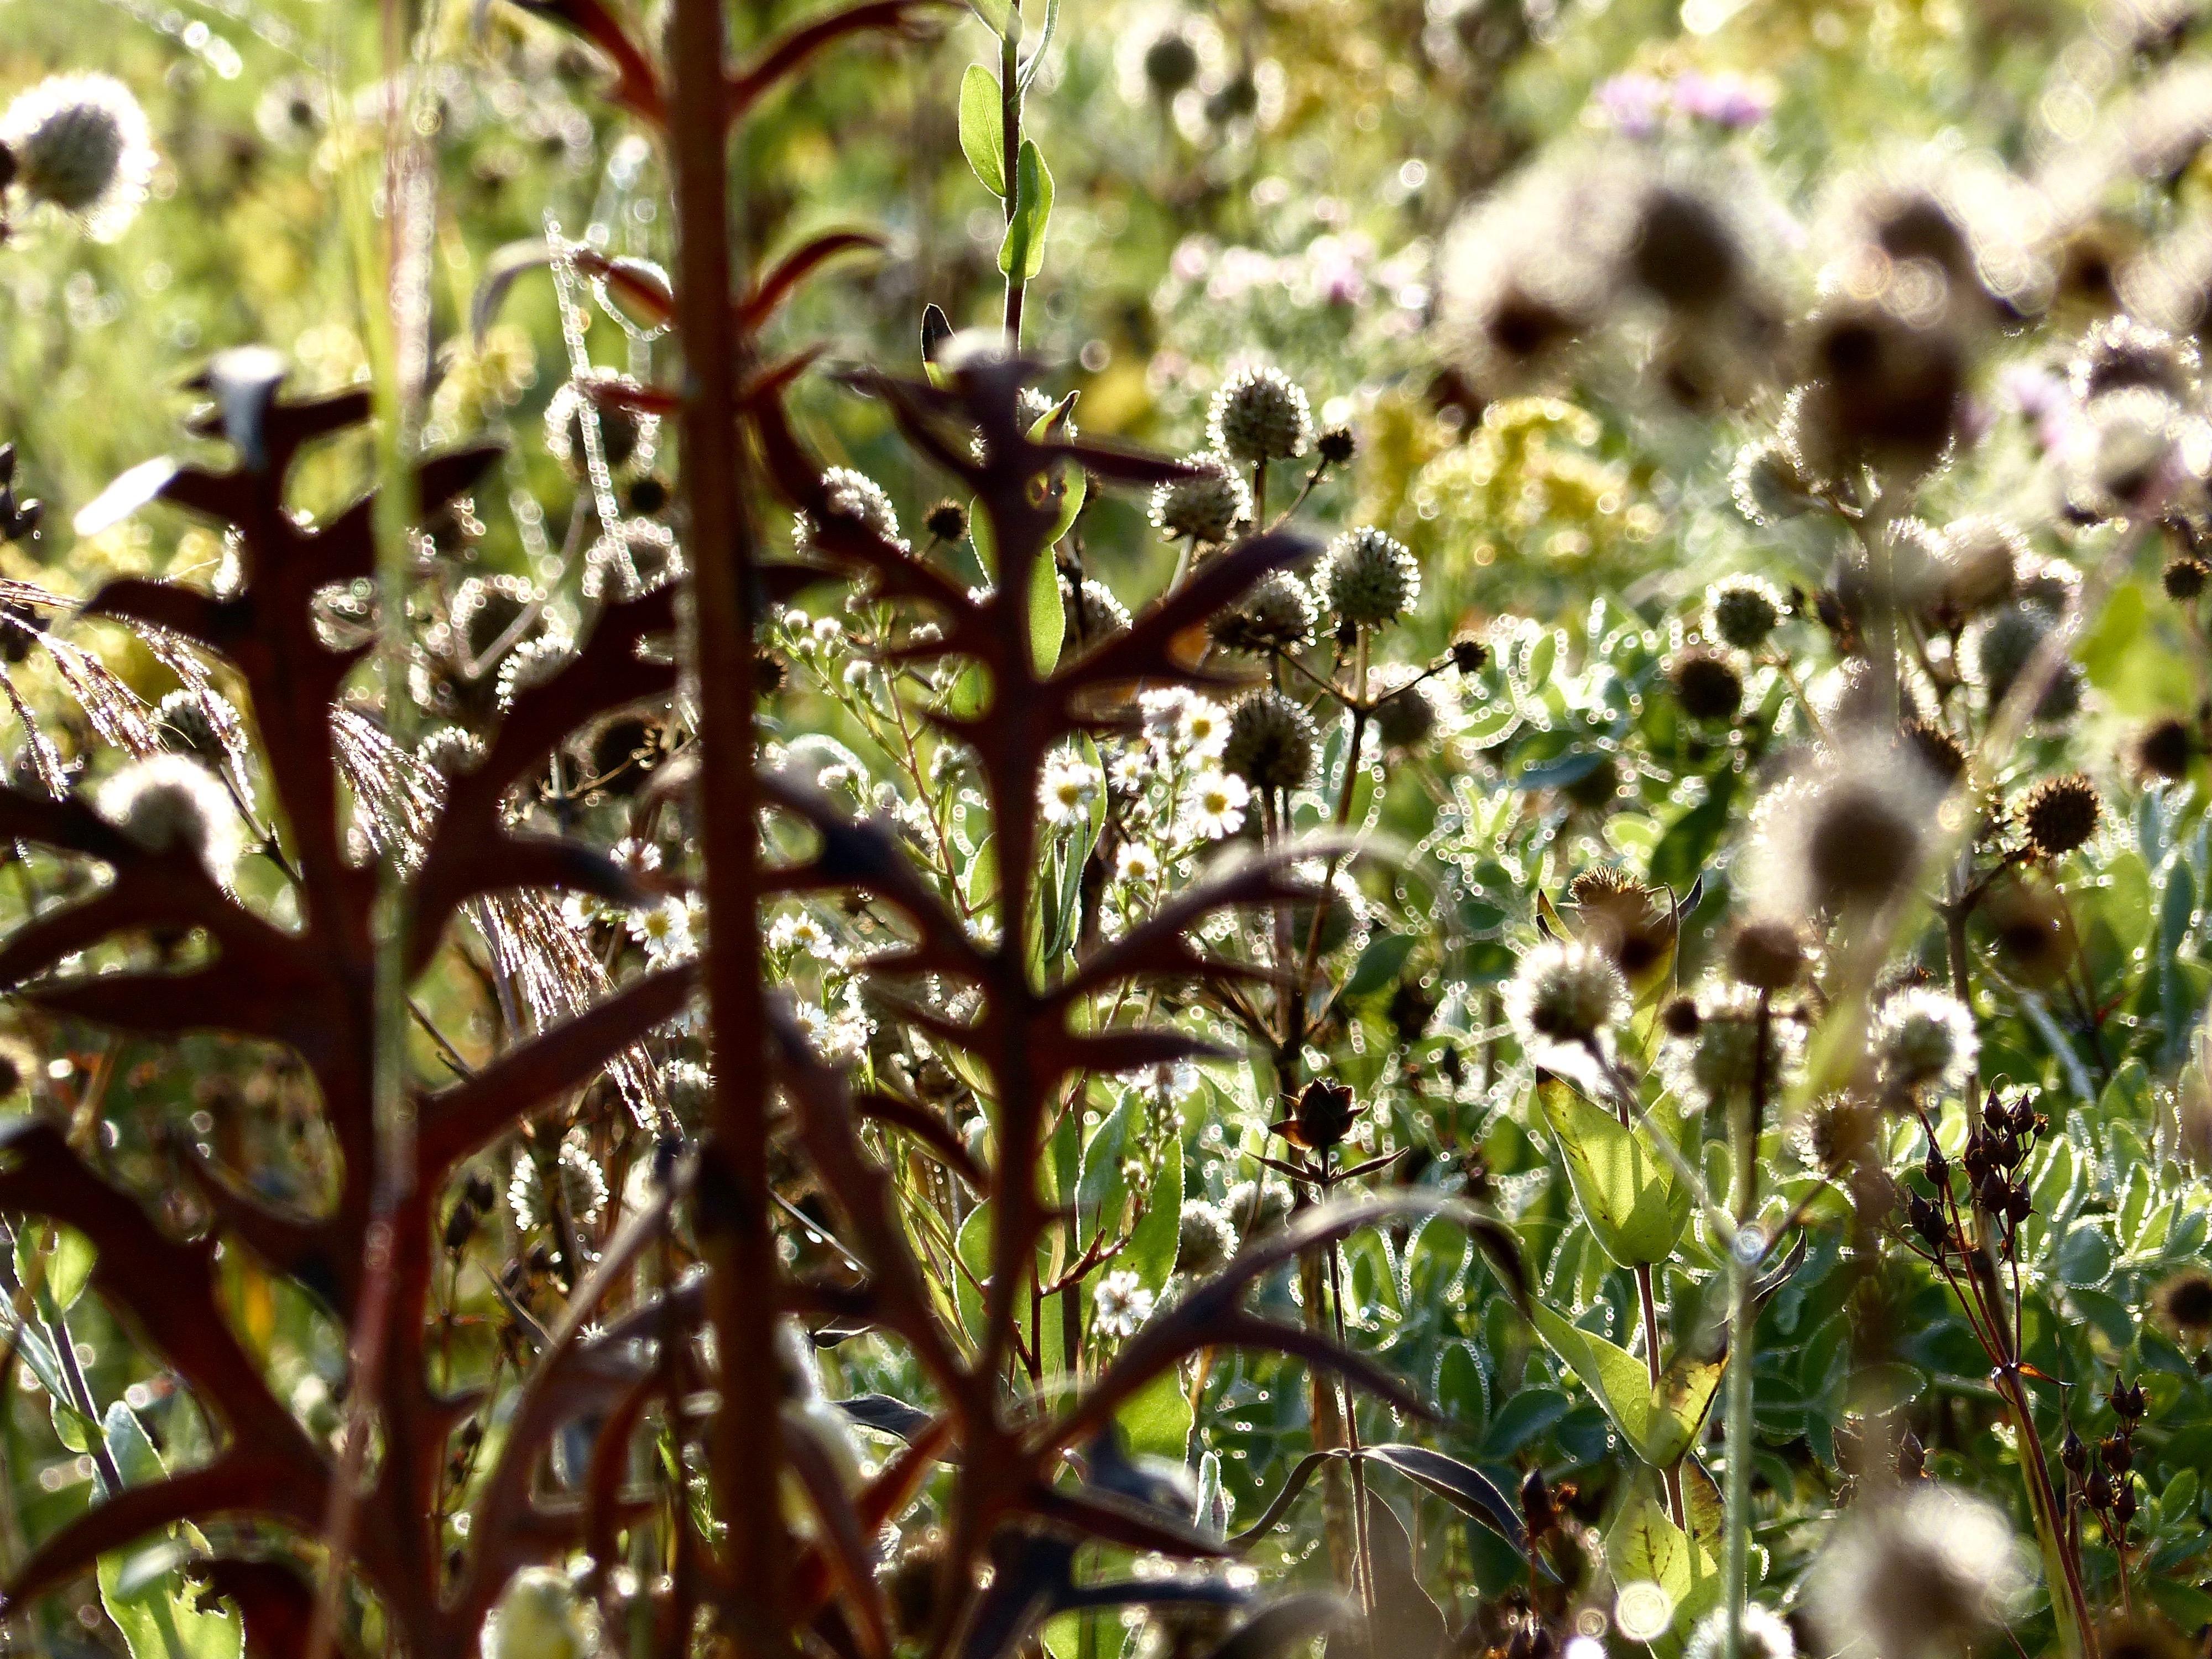 Taltreecompassplantrattlesnake917.jpg